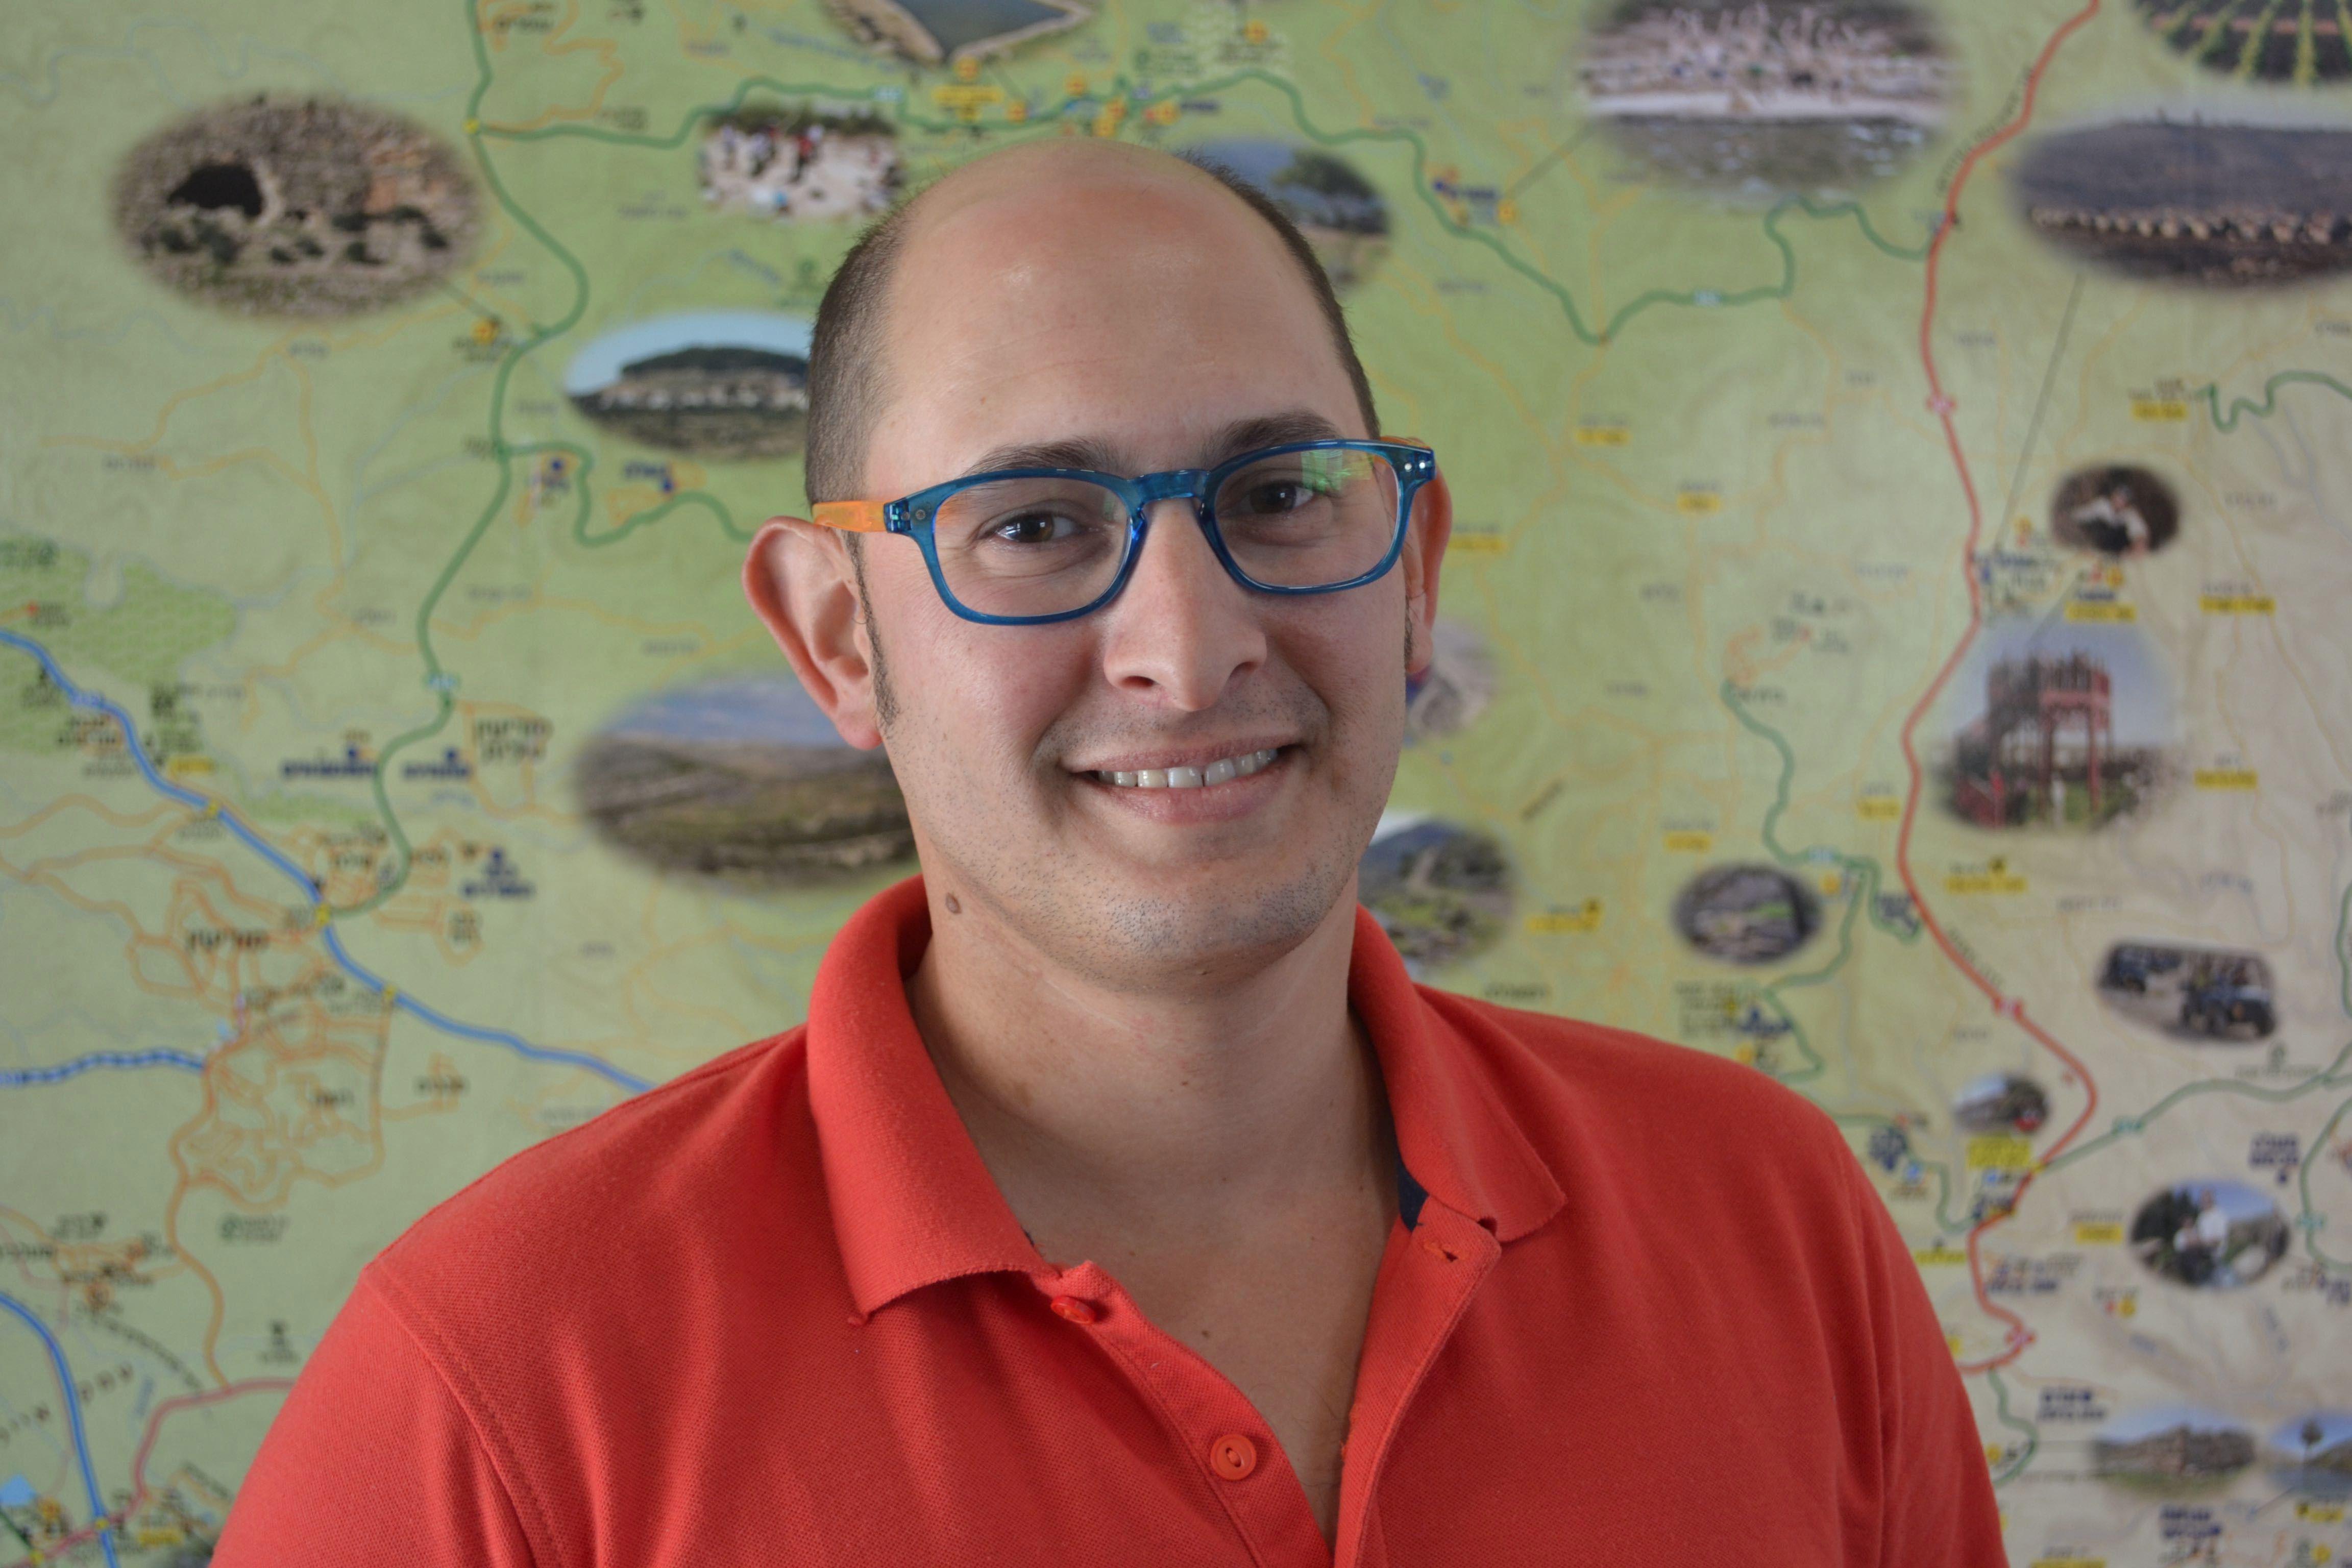 Assaf Lessner is head of marketing at Binyamin Tourism.